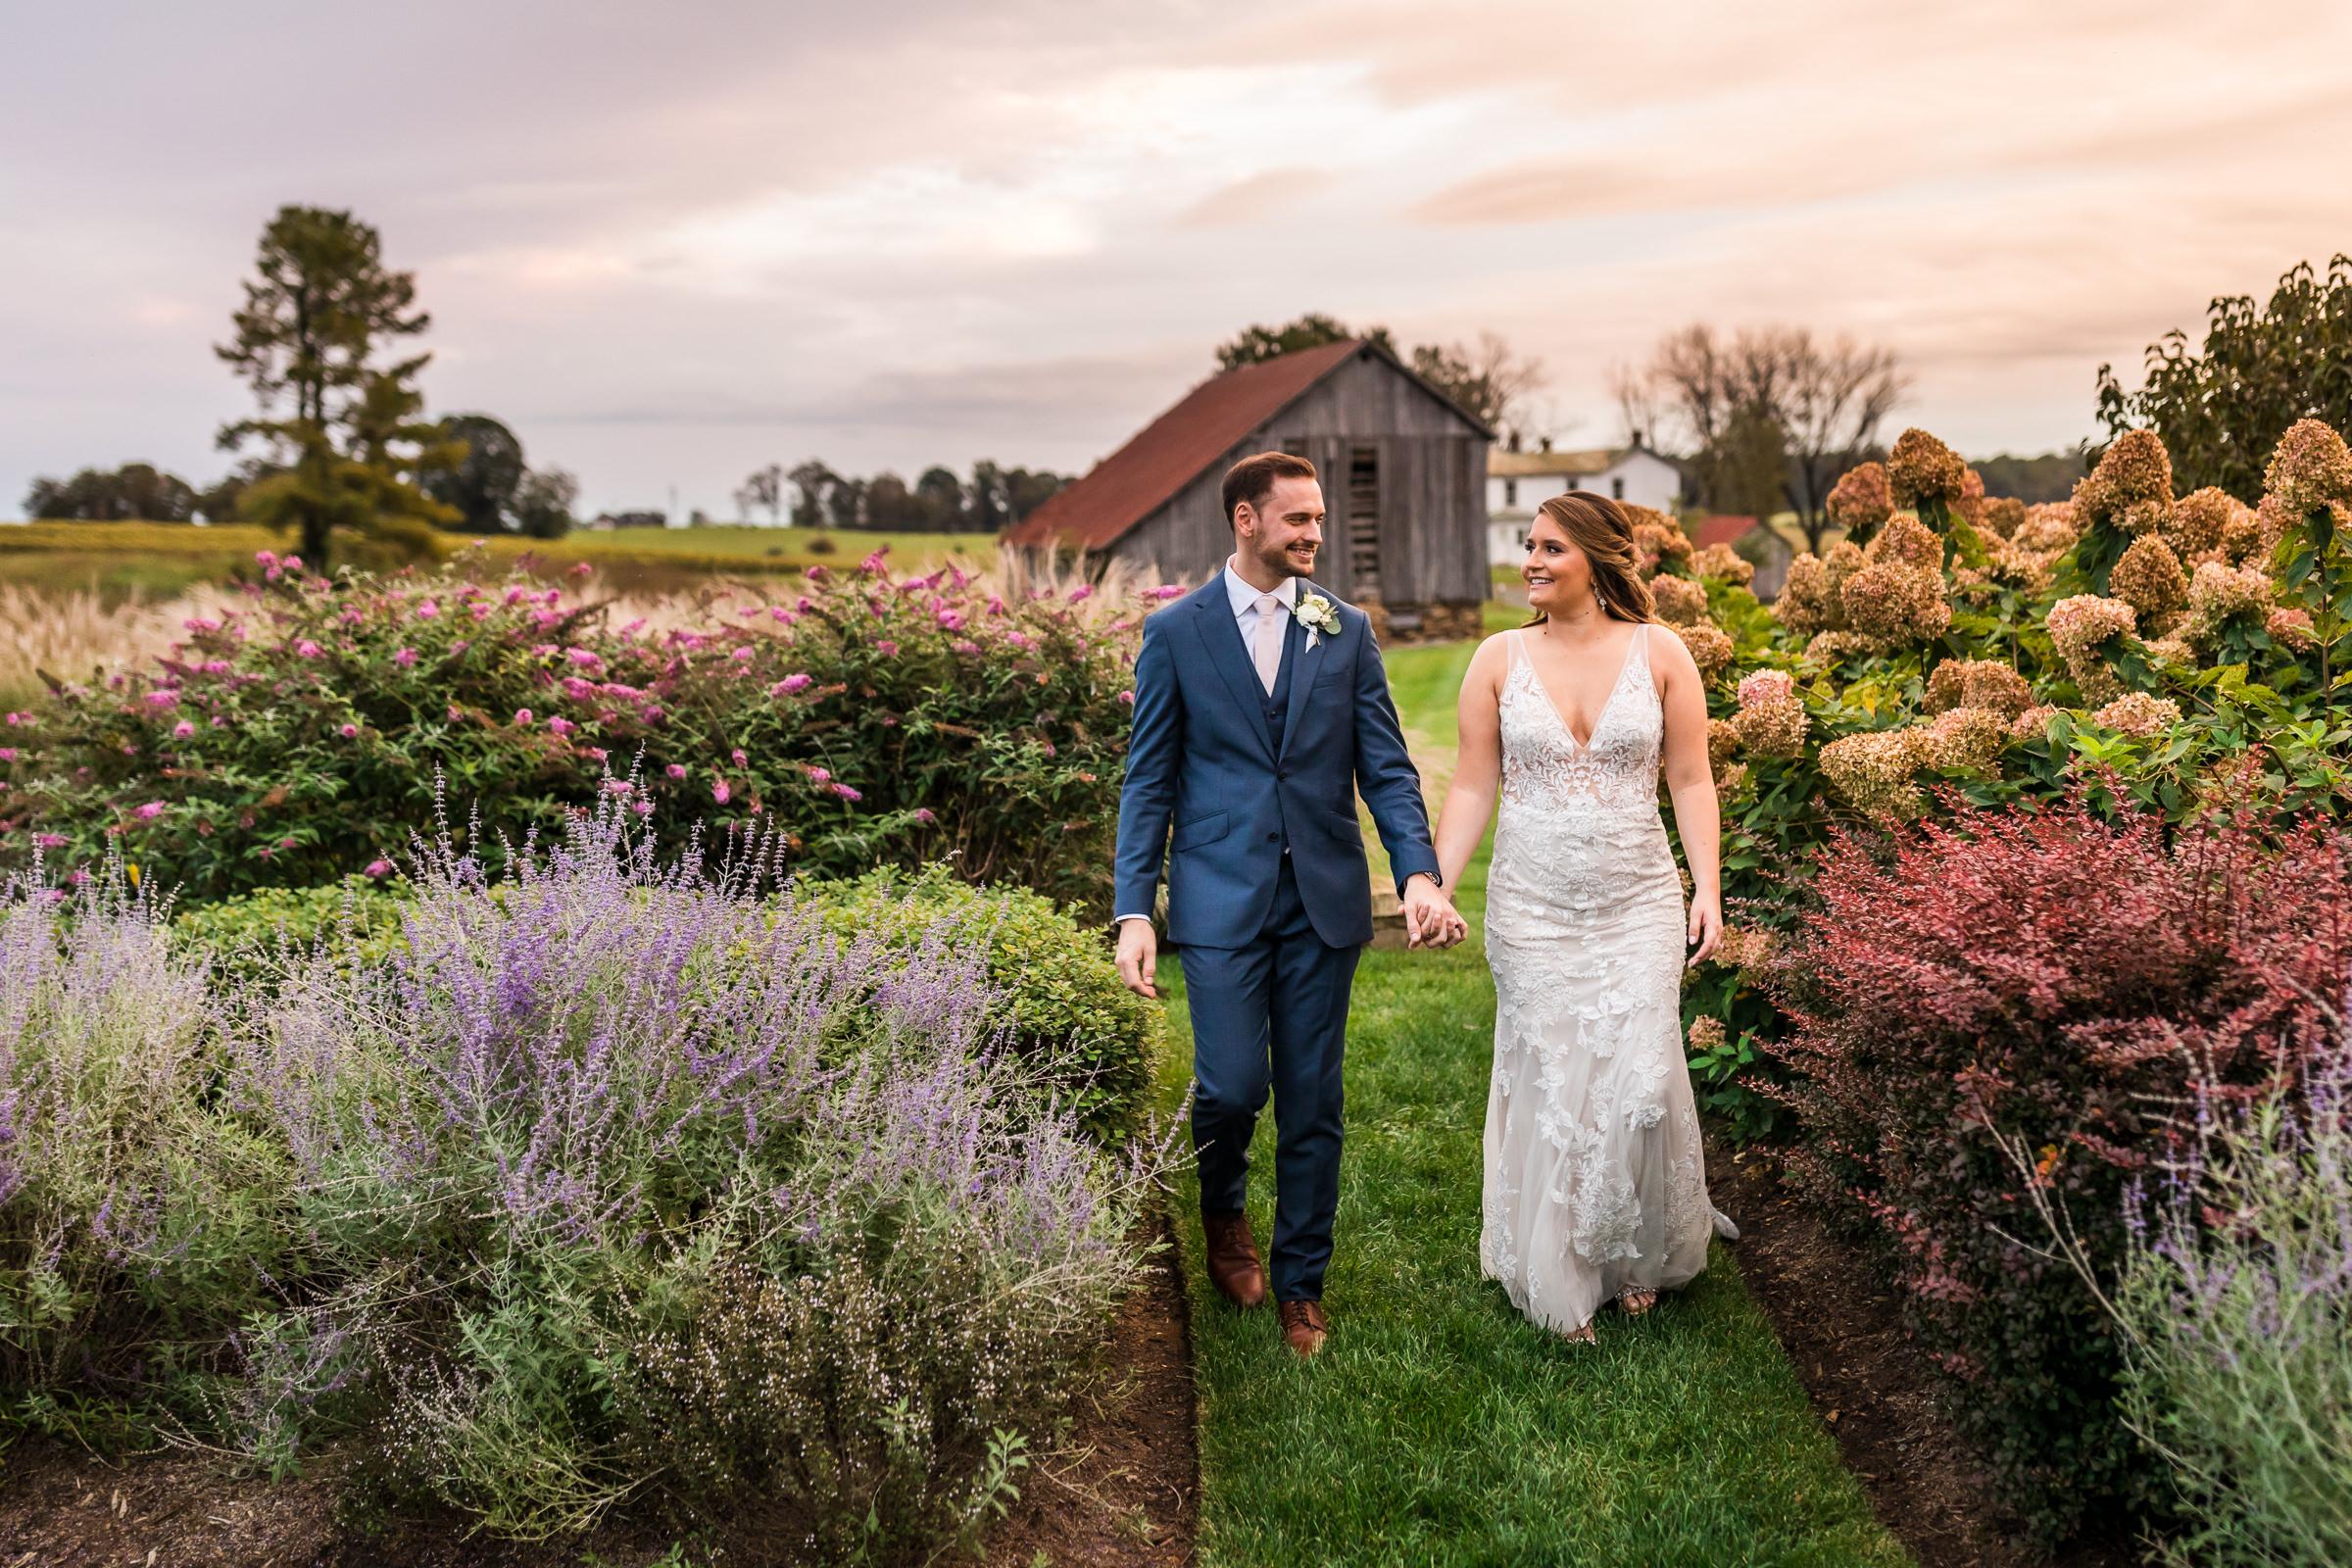 couple-walks-hand-in-hand-in-garden-xiaoqi-li-photography